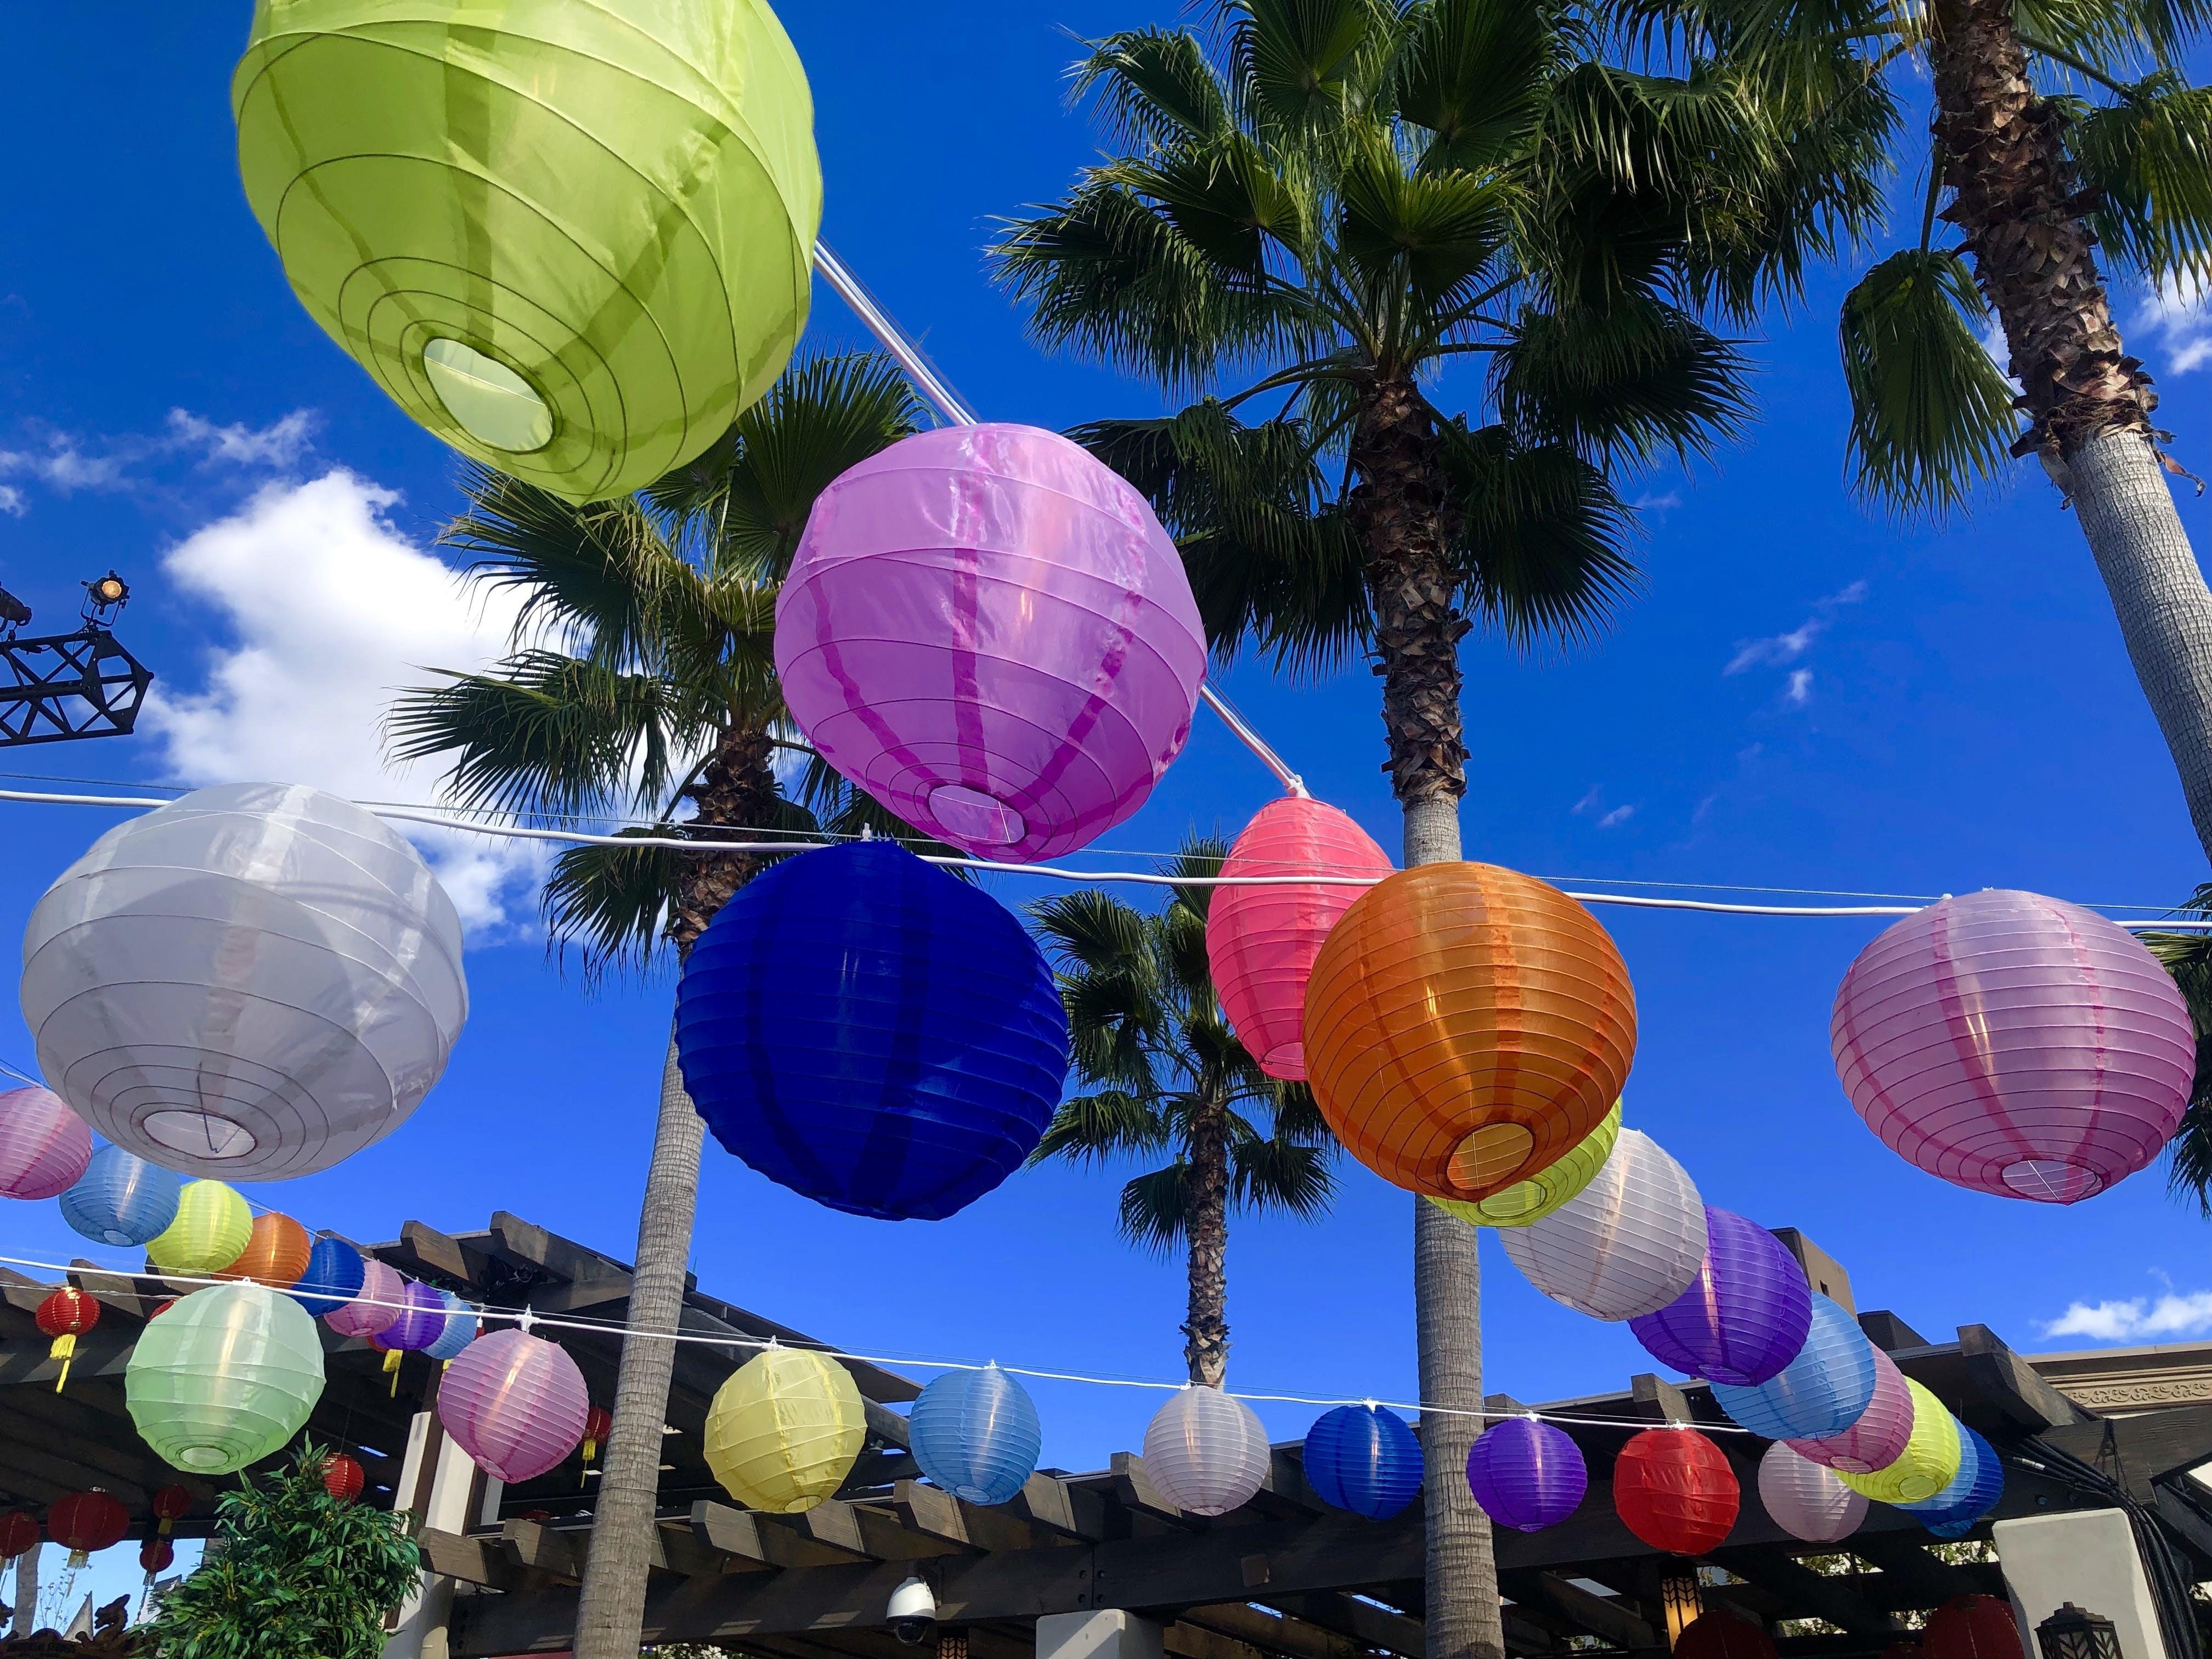 Free stock photo of chinese lanterns, colorful, palm trees, paper lanterns